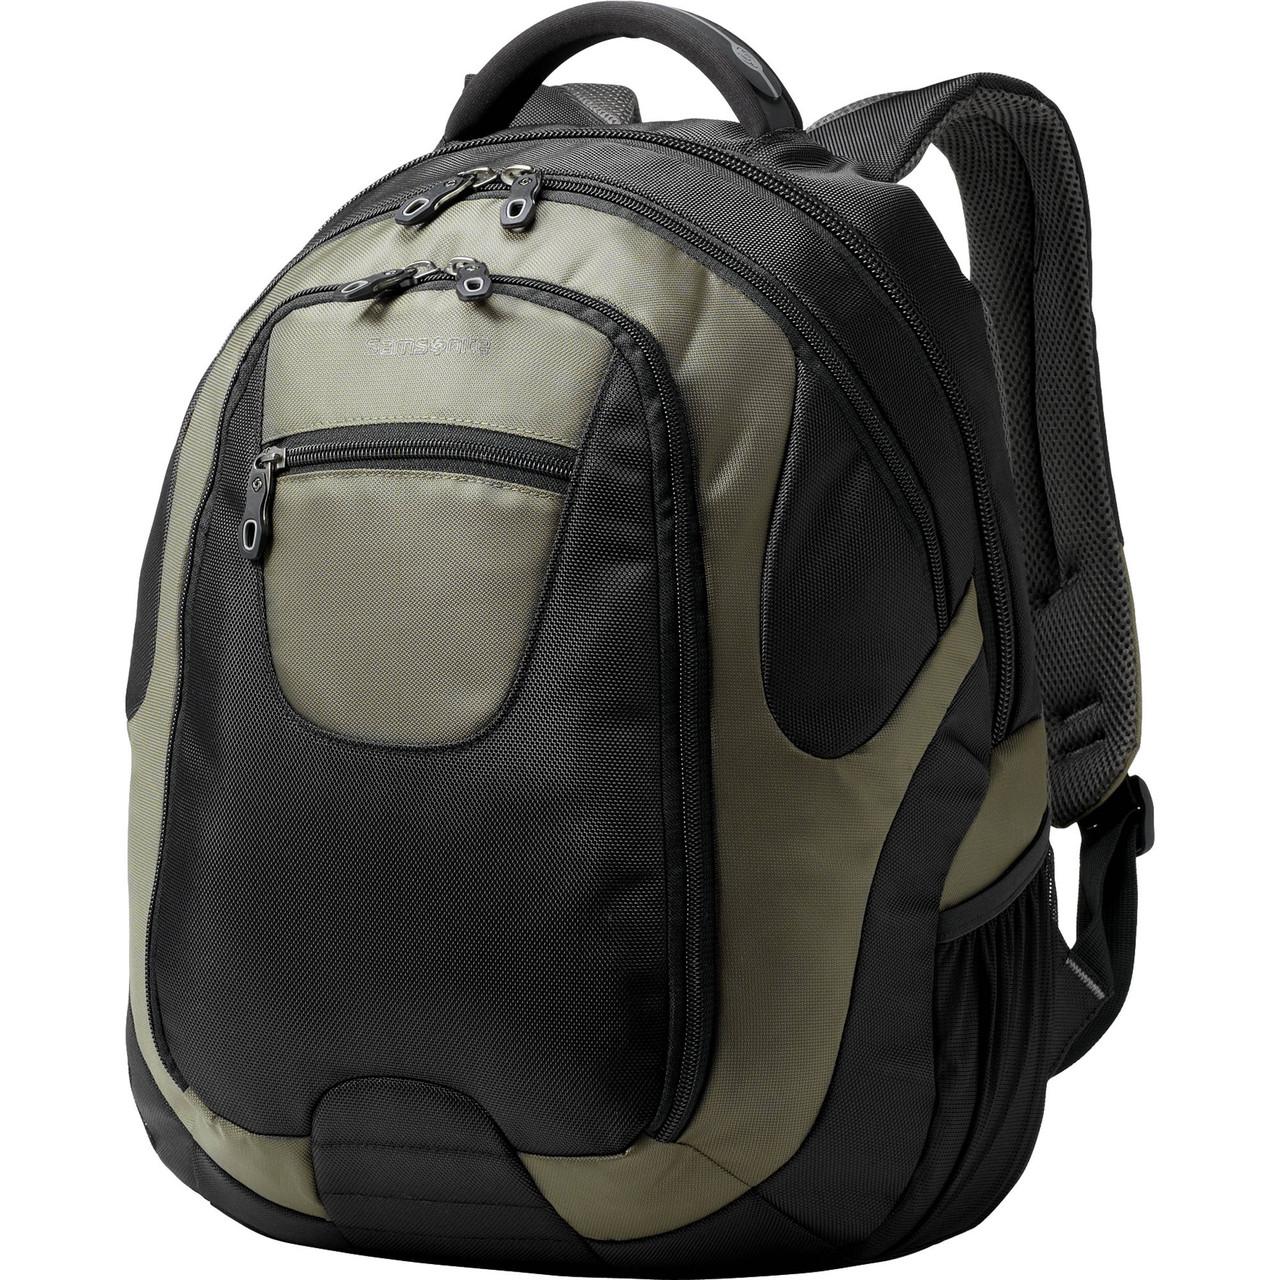 Рюкзак для ноутбука Samsonite Tectonic Medium Backpack